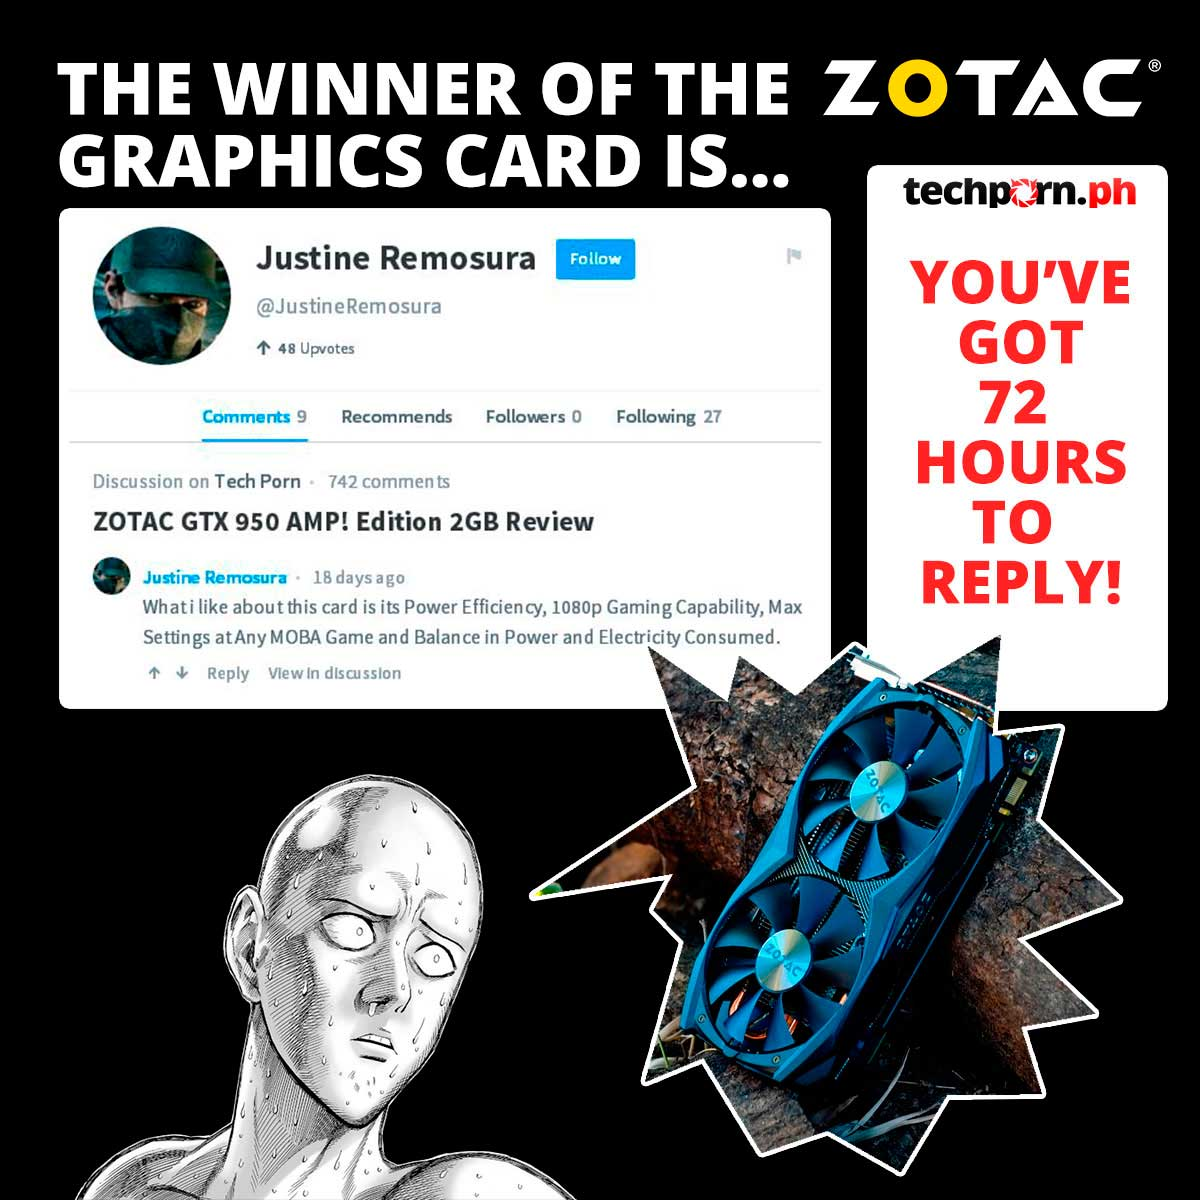 ZOTAC-2015-Giveaway-Winner